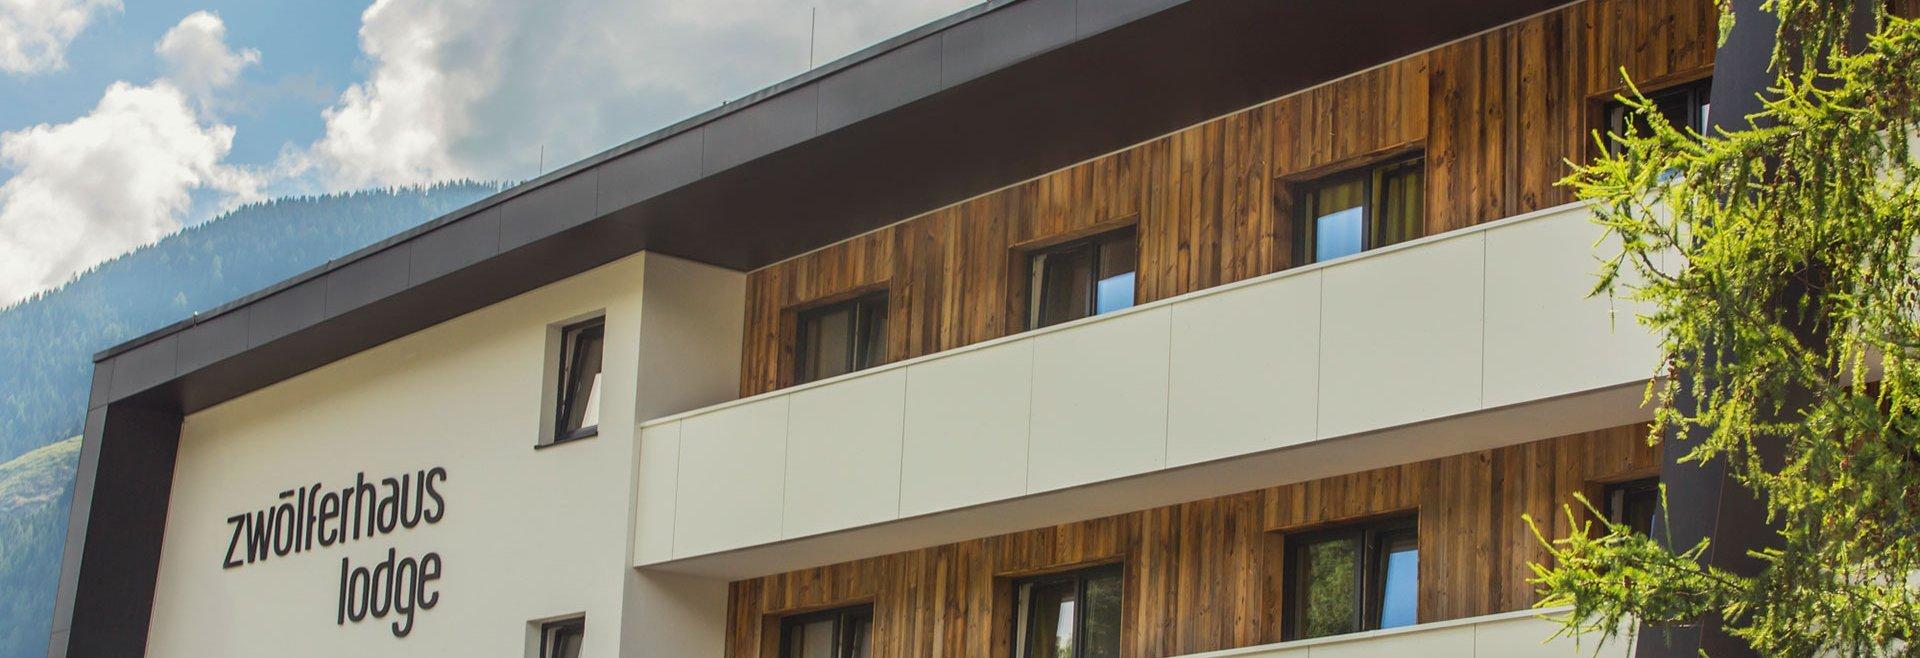 Mitarbeiterhaus Zwölferhaus Lodge